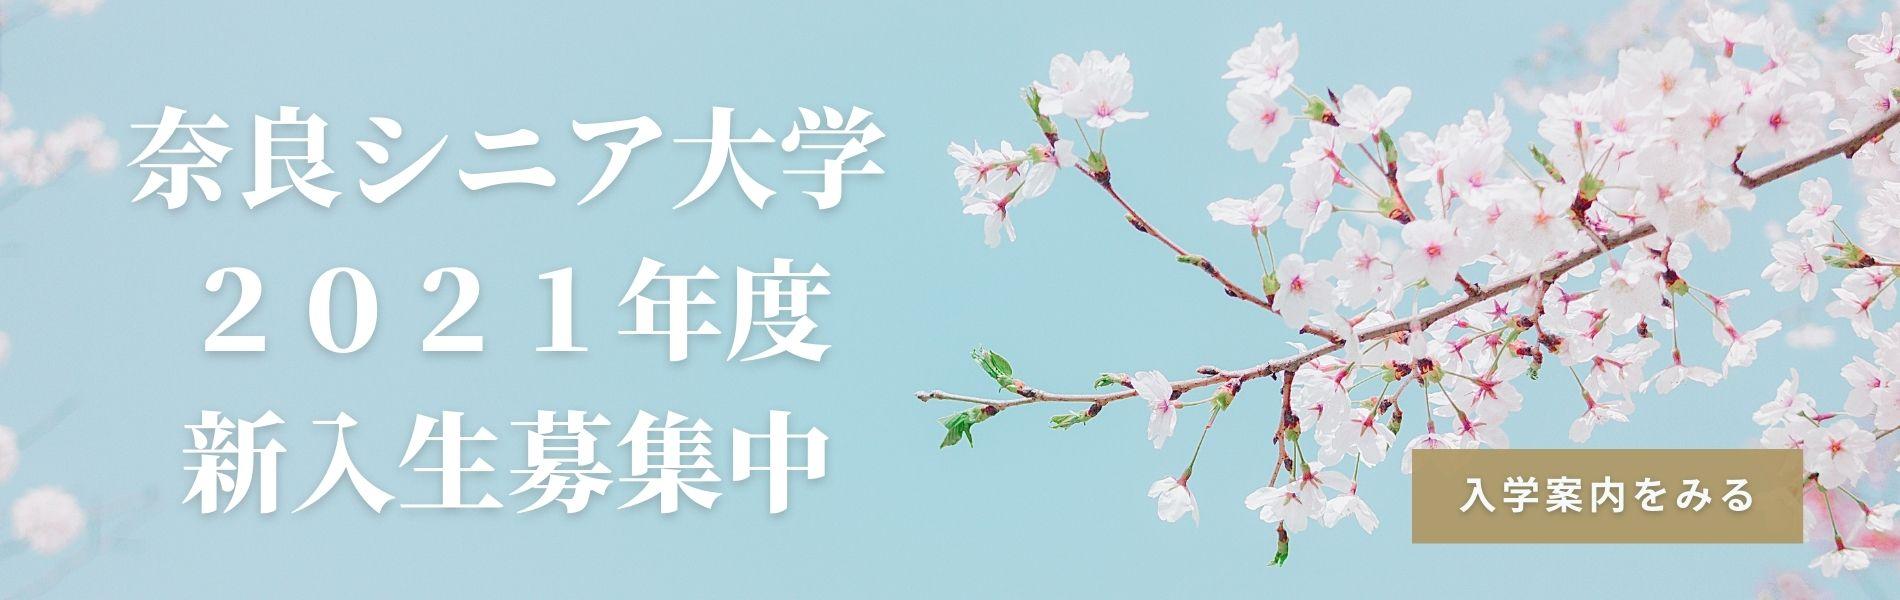 奈良シニア大学新入生募集